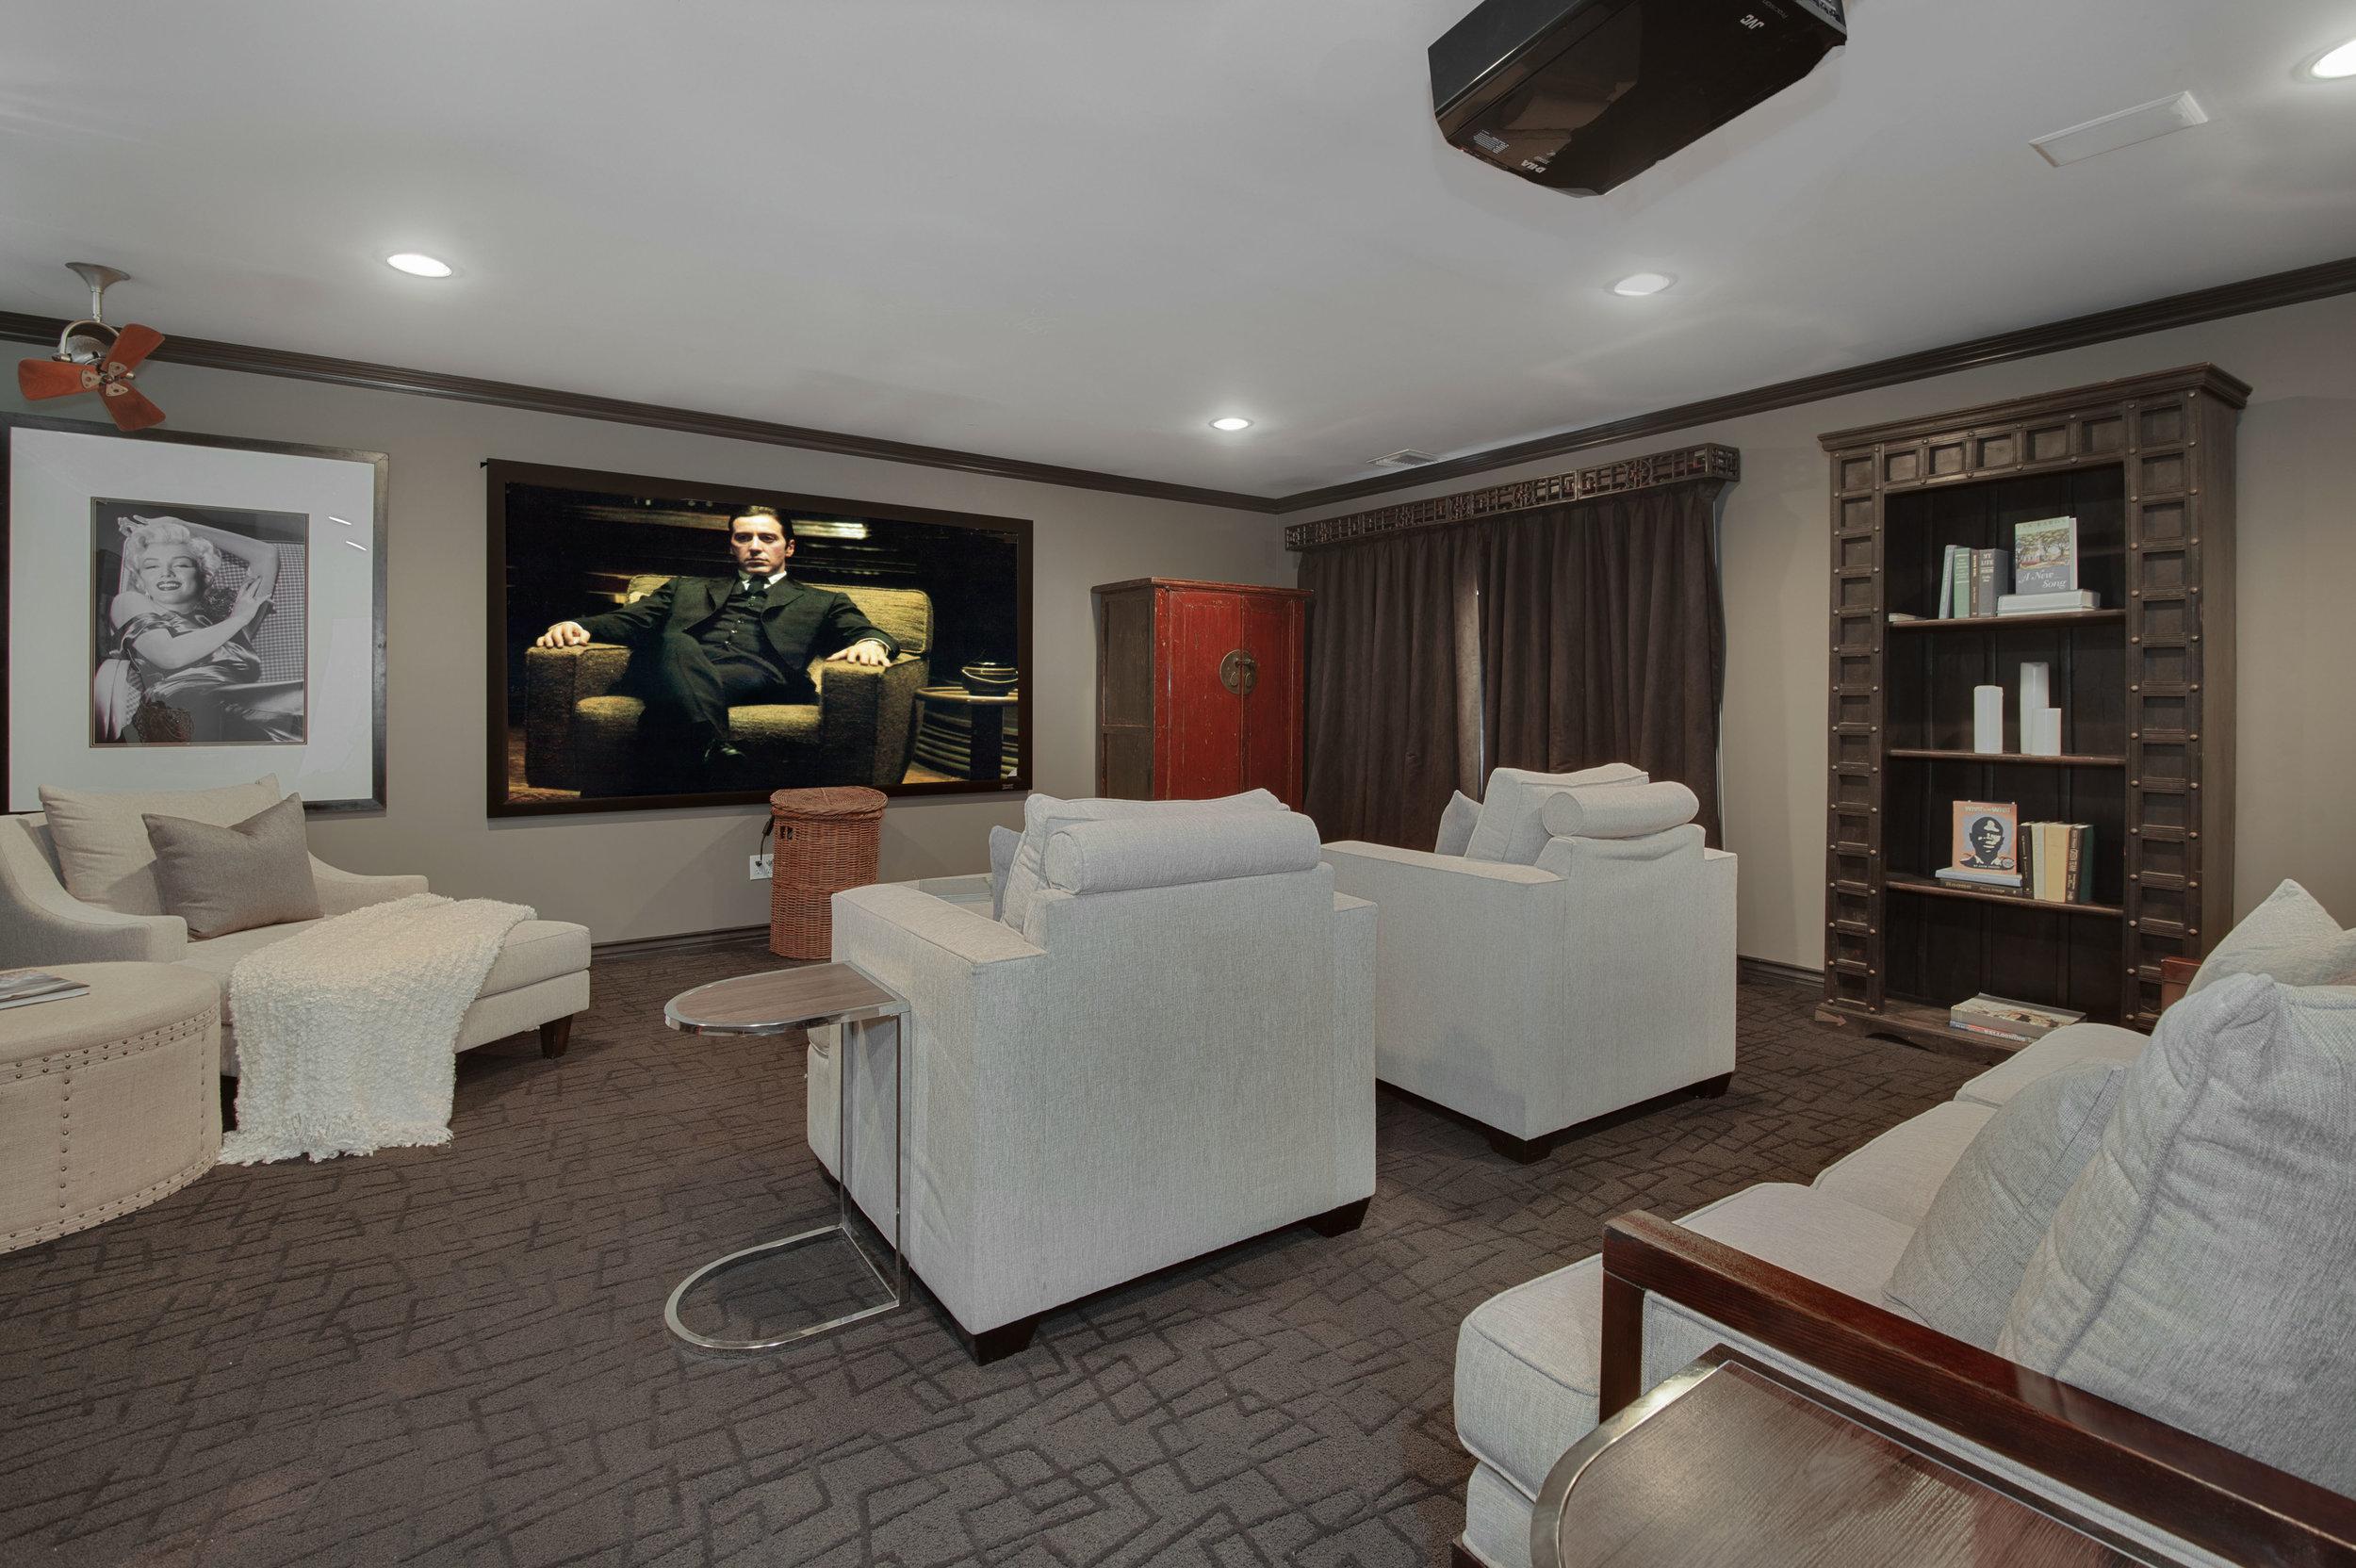 005 Movie Theatre 25342 Malibu Road For Sale Lease The Malibu Life Team Luxury Real Estate.jpg